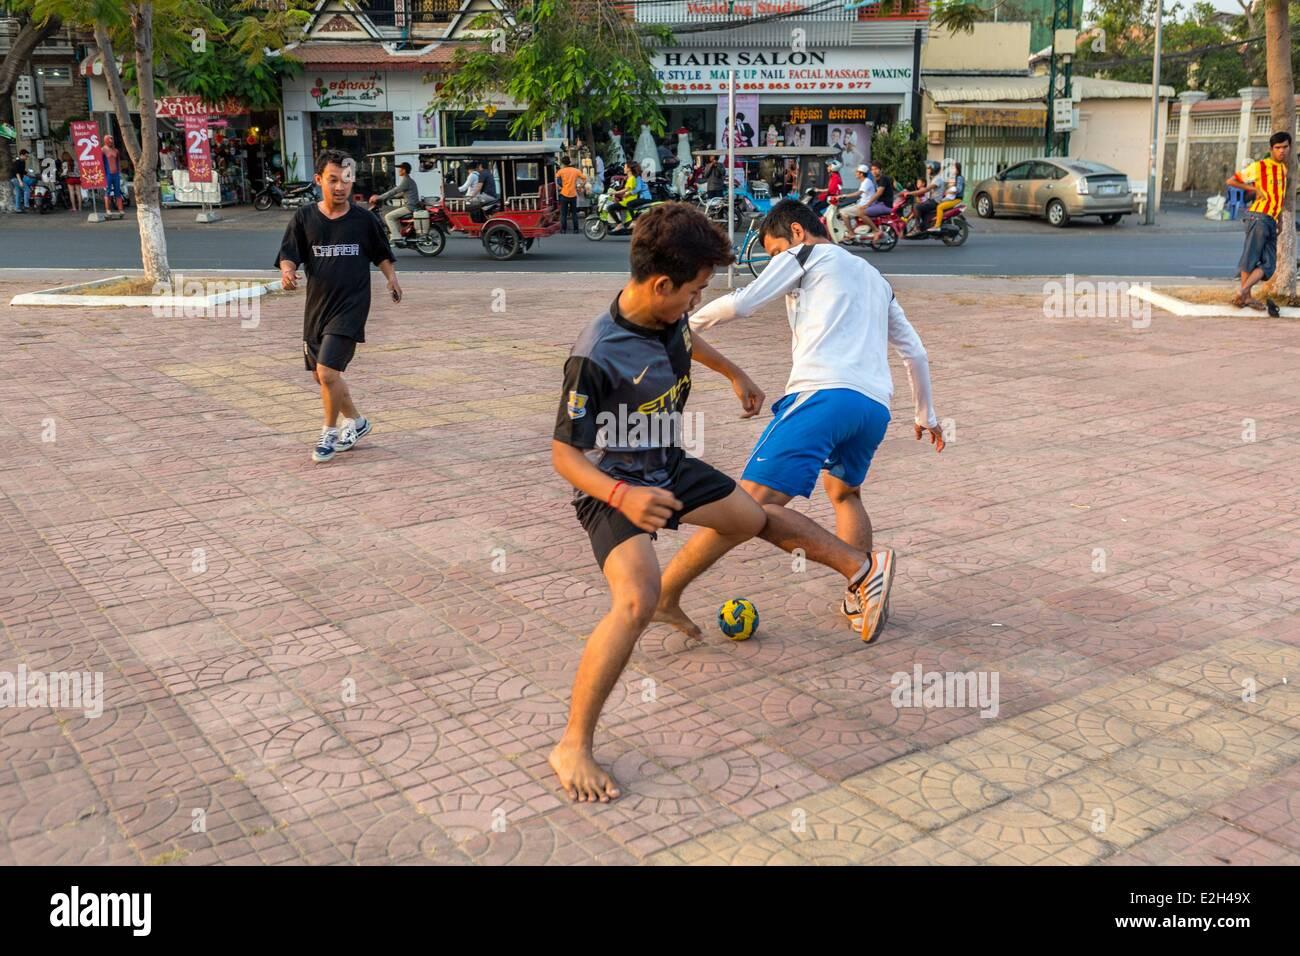 Cambodia Phnom Penh soccer play - Stock Image